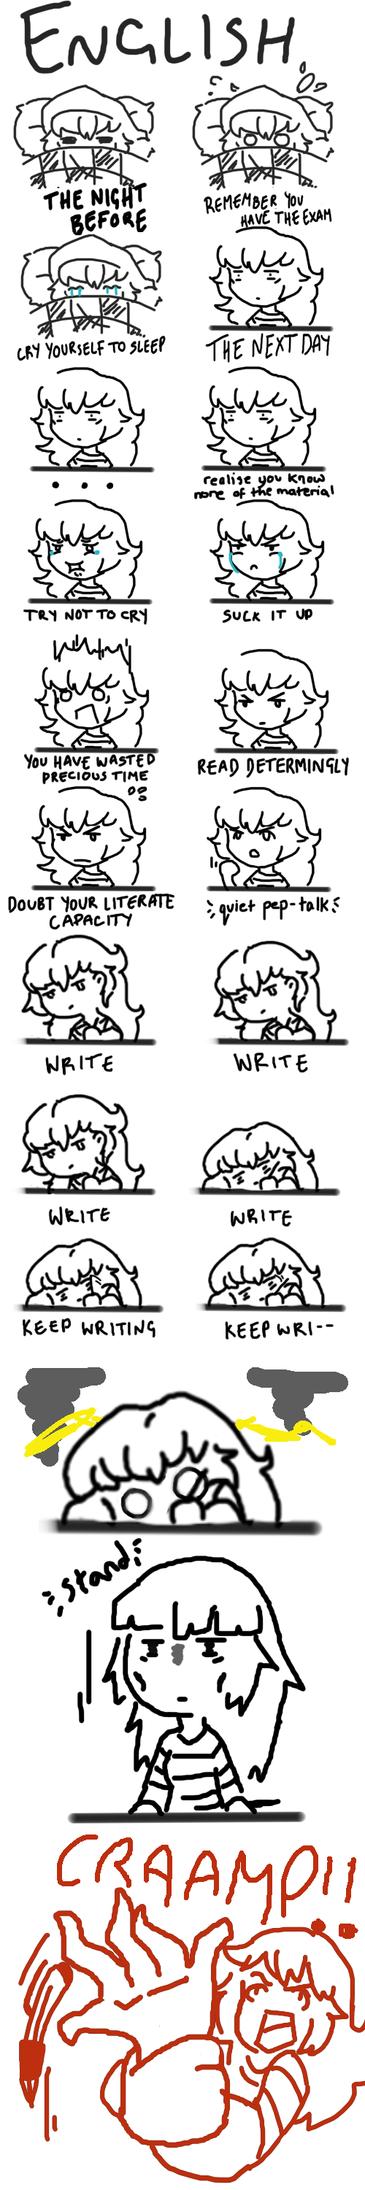 Types of Exams (T.O.E) - English by Pheon123